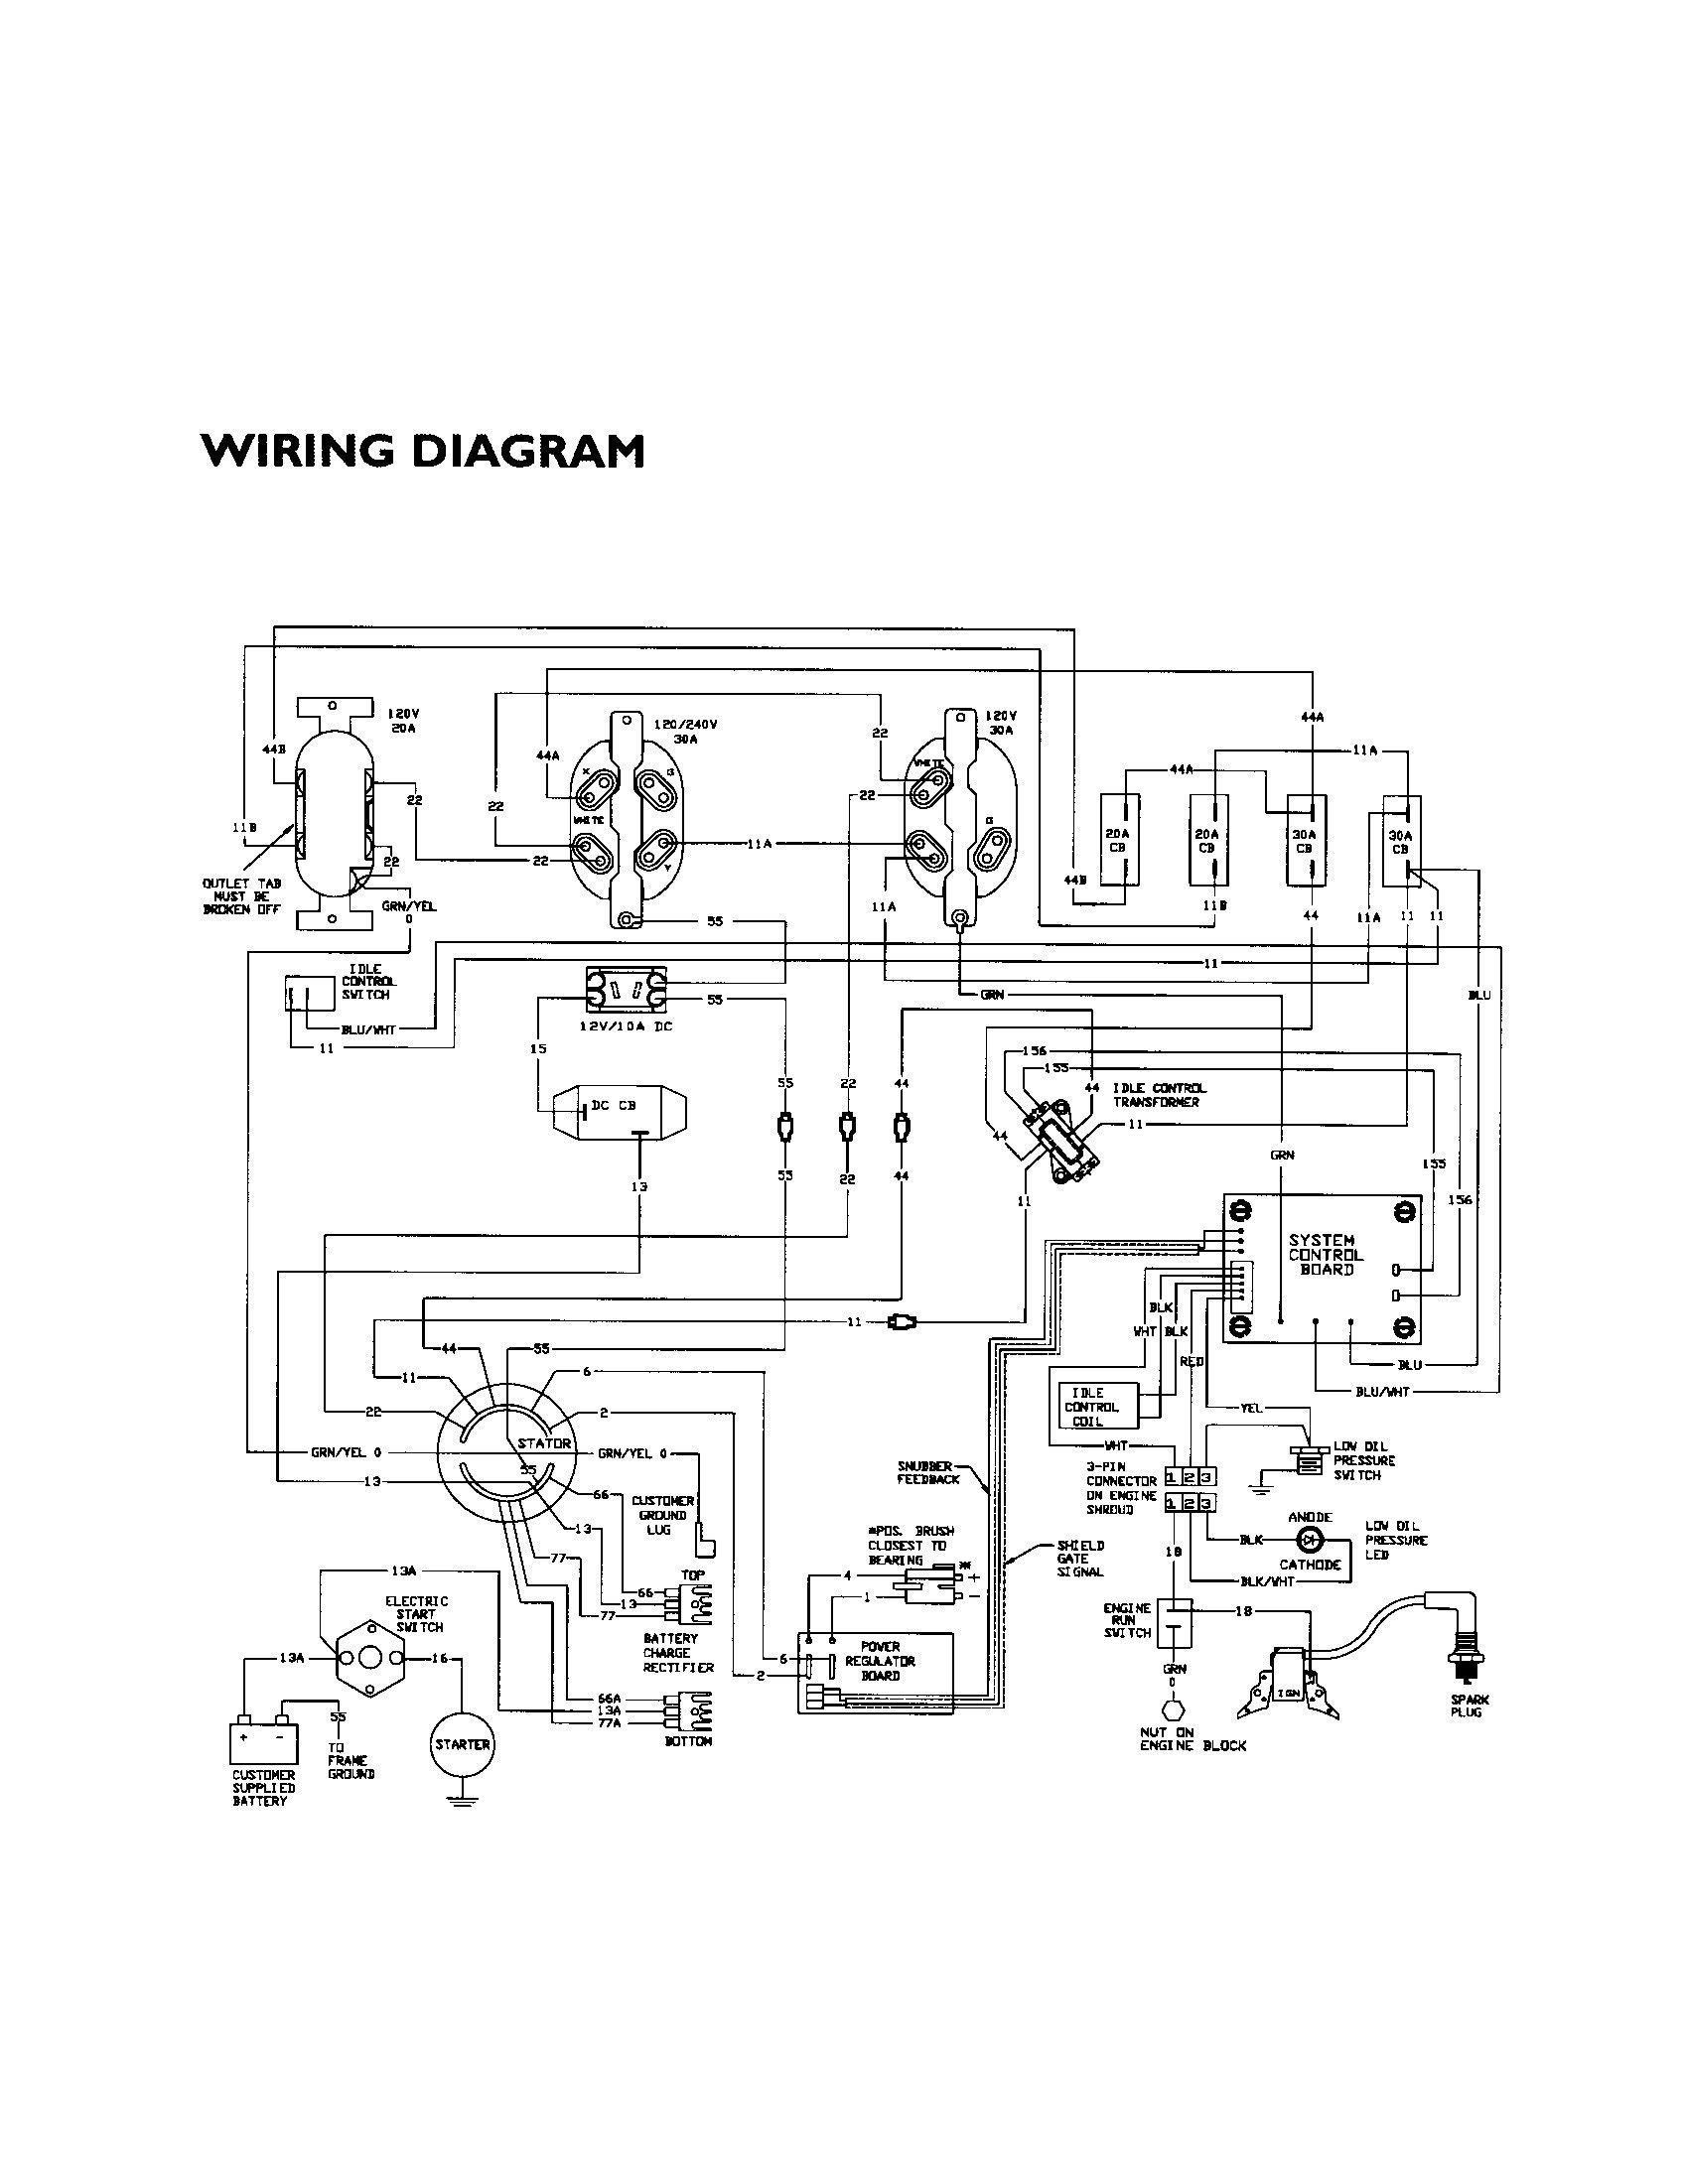 4400 International Truck Wiring Diagrams Schematic And Wiring Diagram Generator Transfer Switch Circuit Diagram Diagram